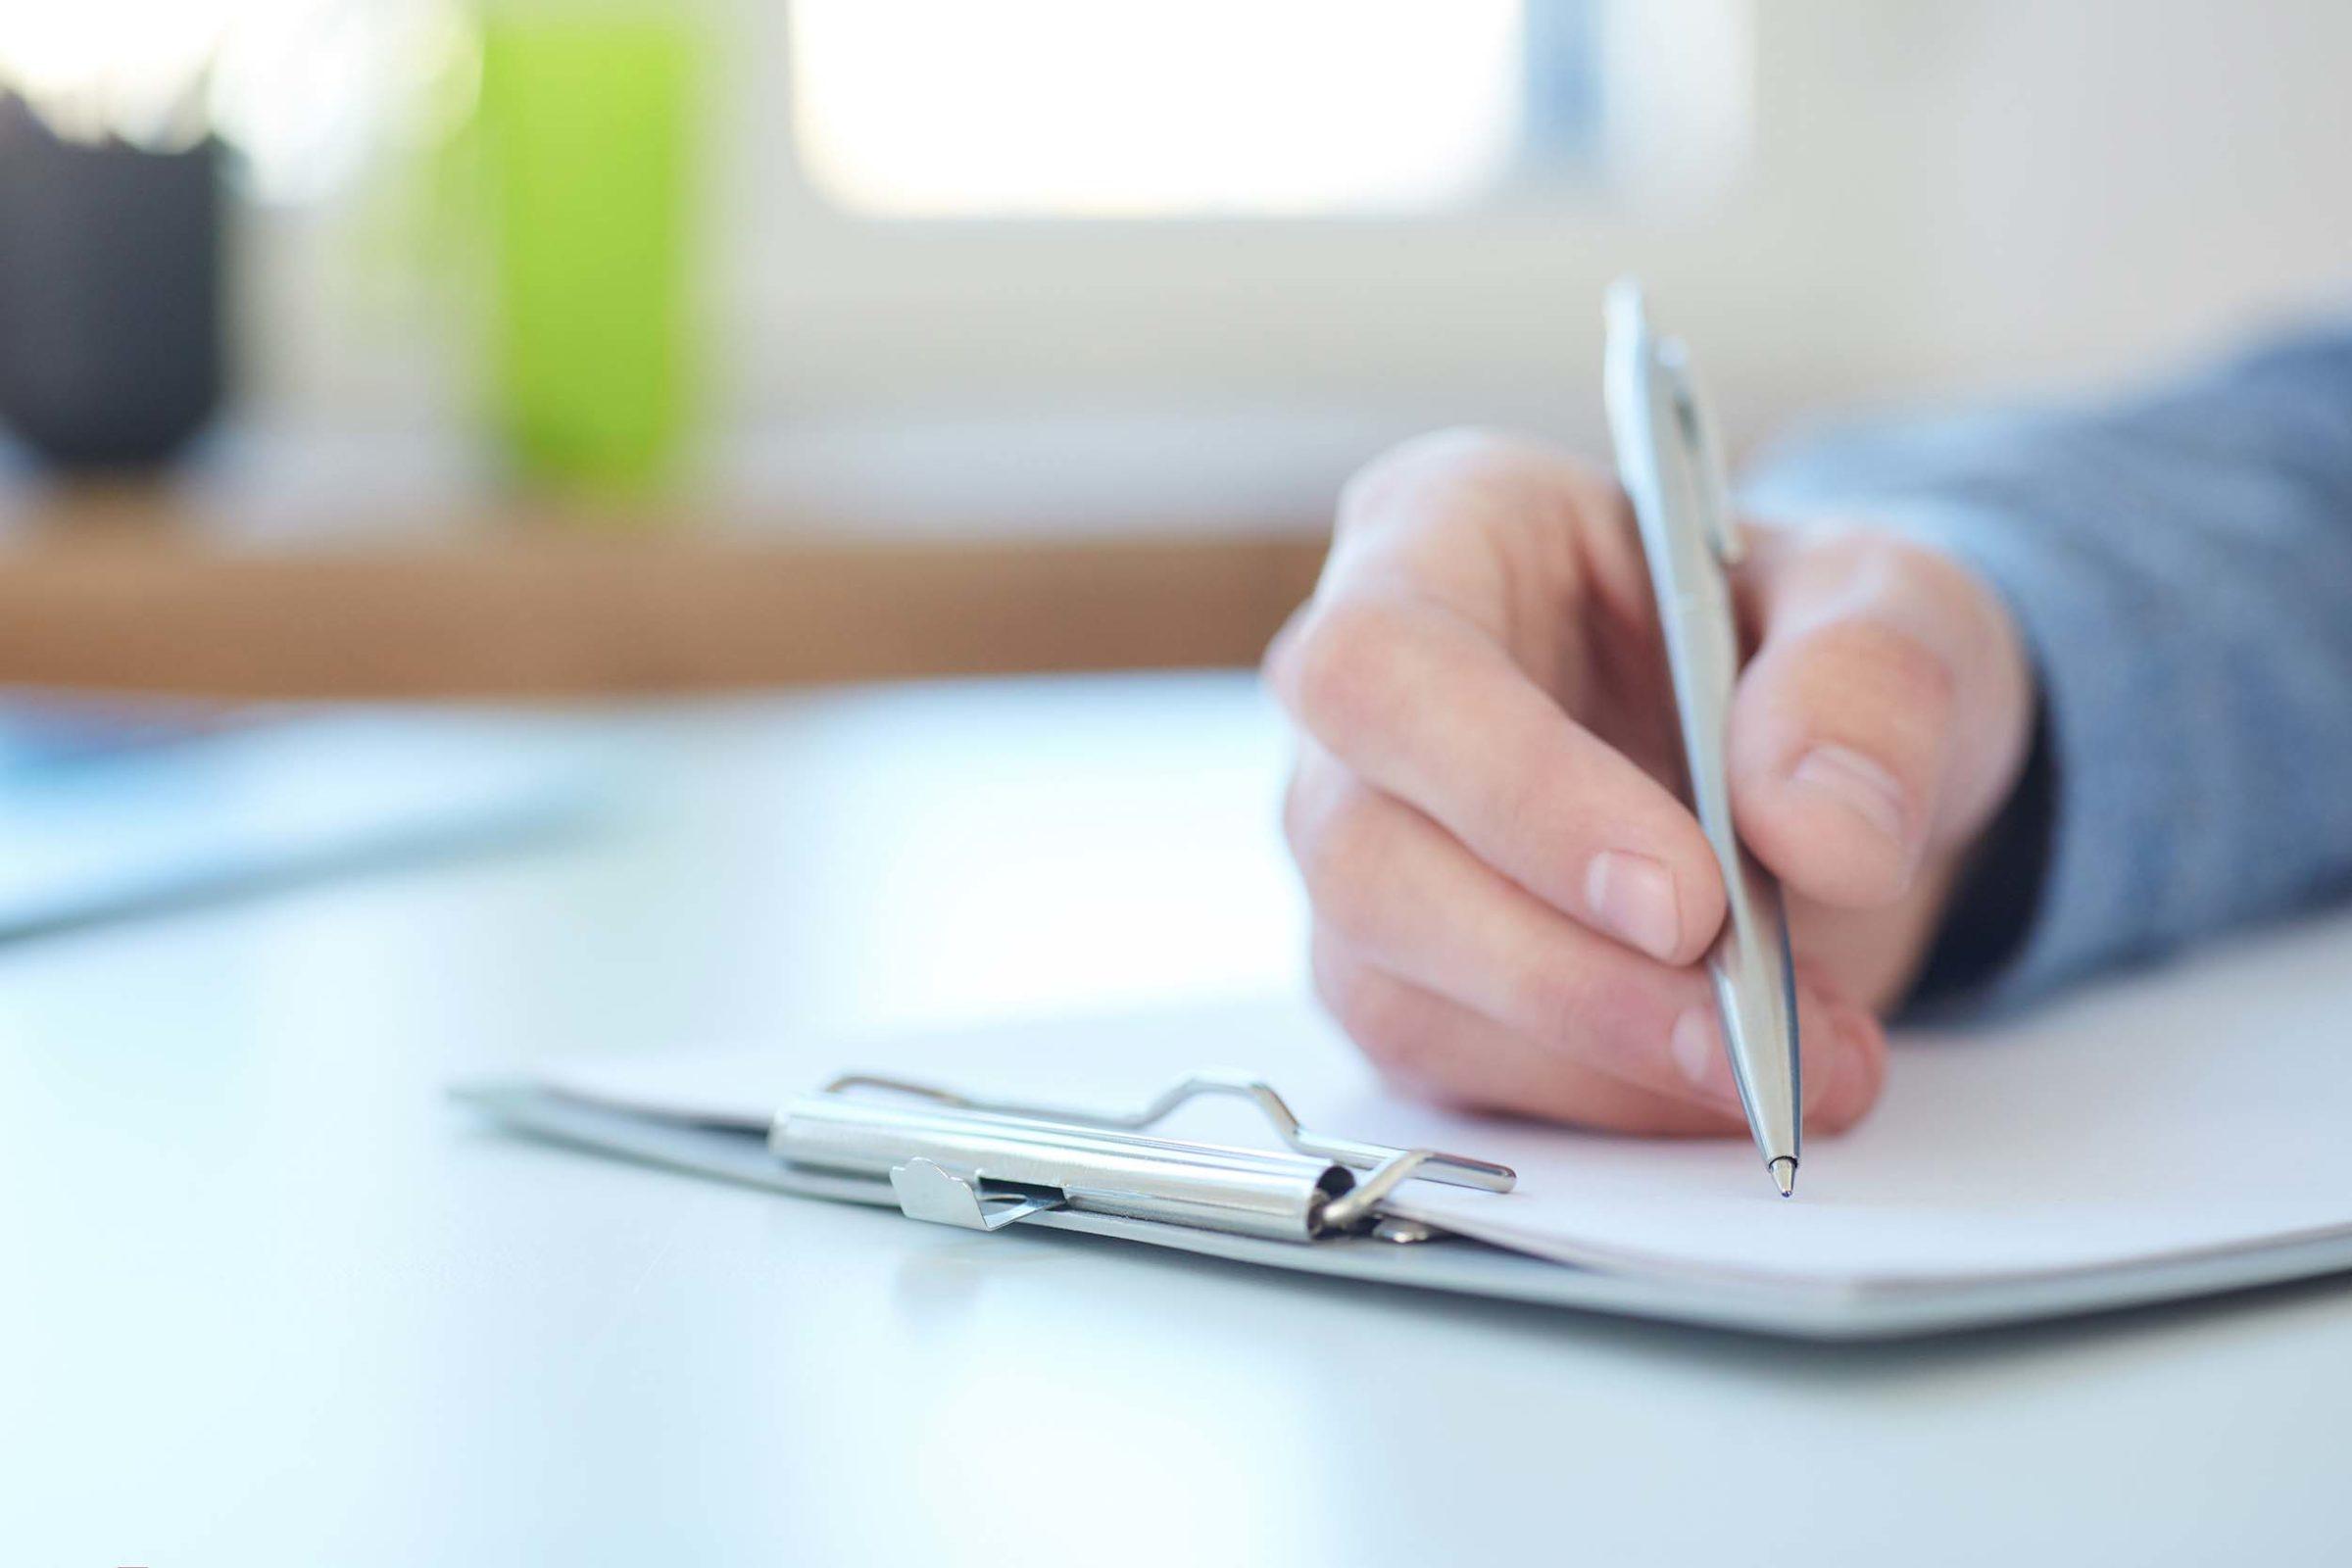 Schufa Auskunft: Hand haelt Stift über Dokument